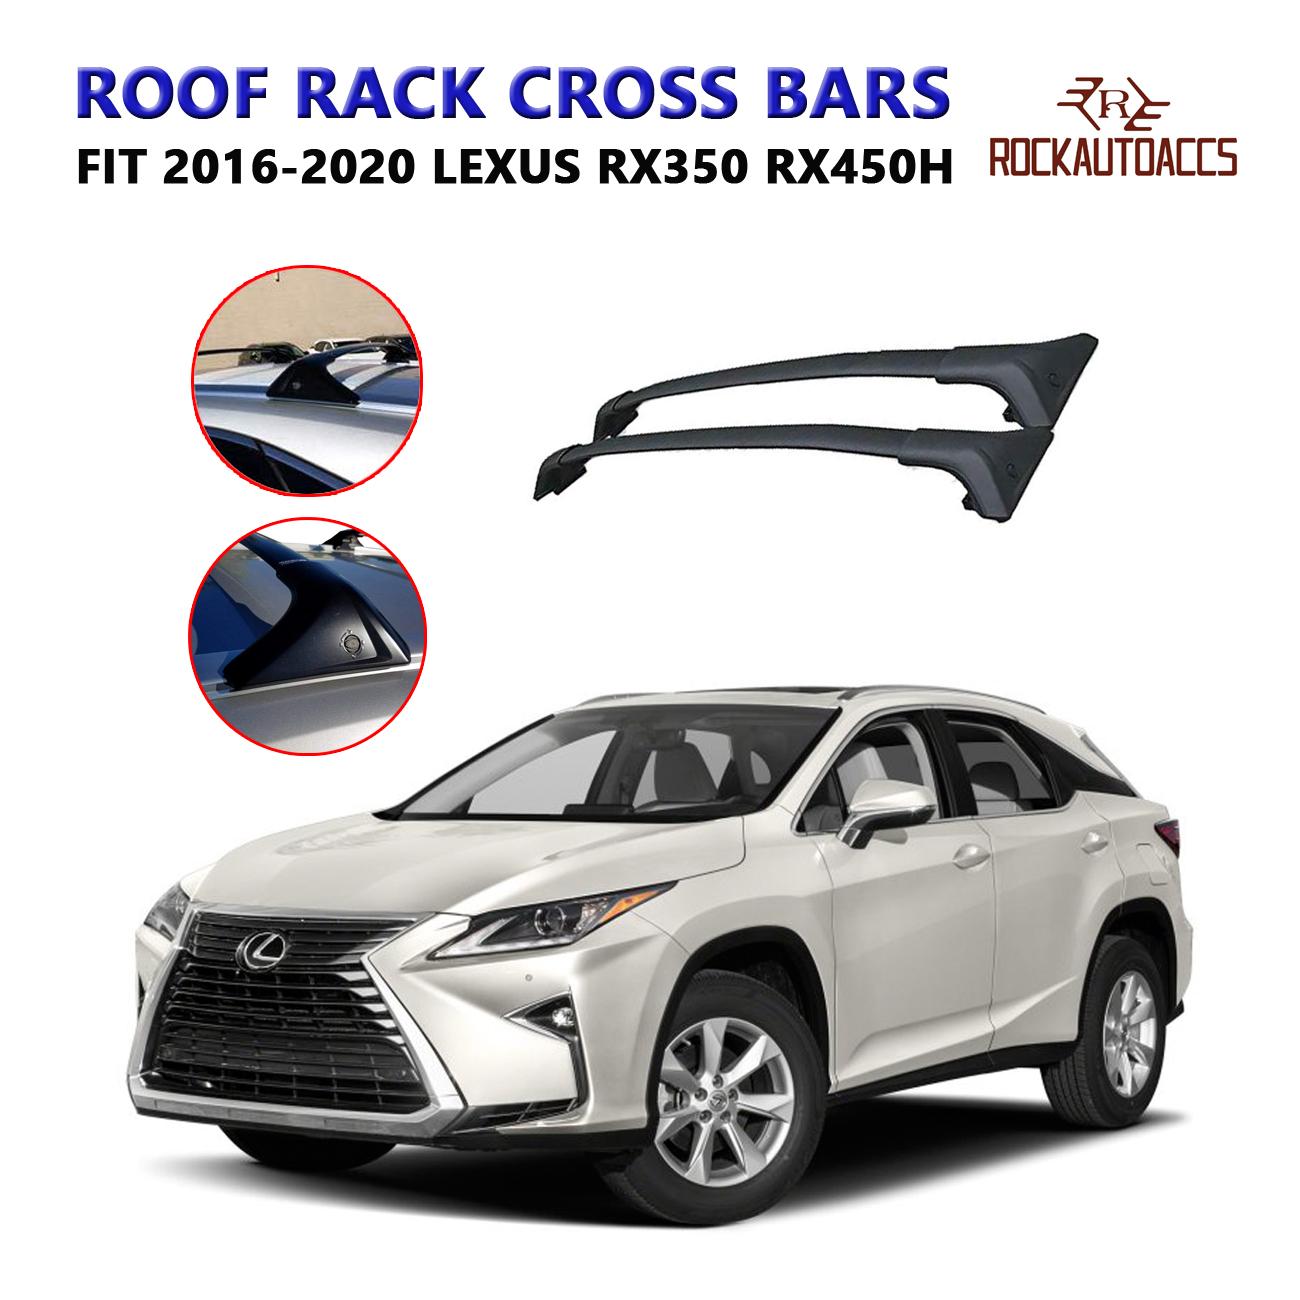 rokiotoex roof rack crossbars side rail cross bars fit 2016 2020 lexus rx350 rx450h rooftop factory flush roof rails kayak cargo luggage carrier